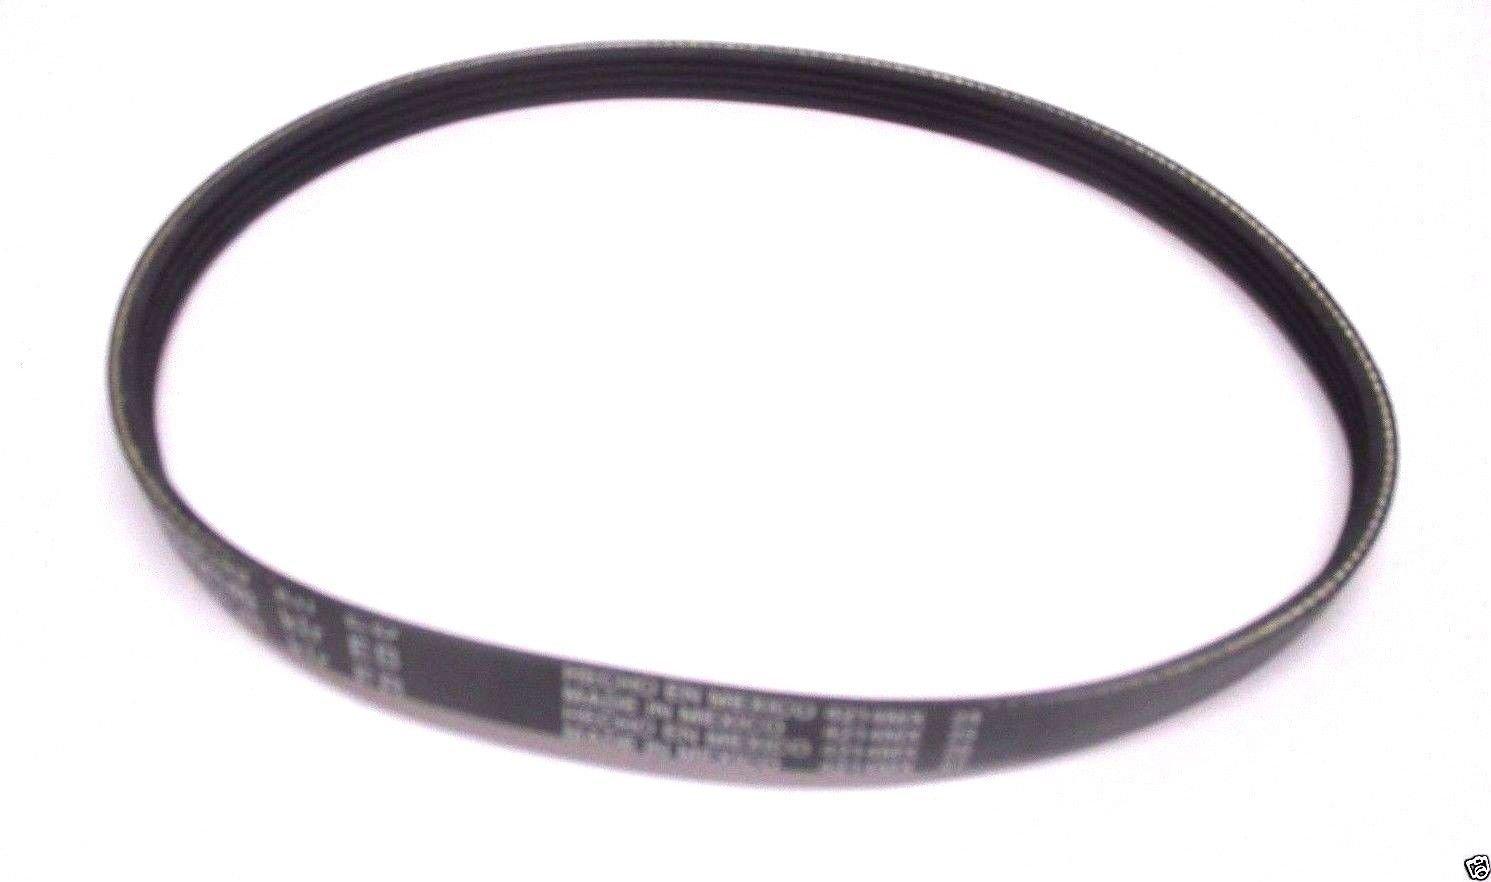 MTD Genuine 754-04149 Edger Drive Belt Fits Troy Bilt OEM